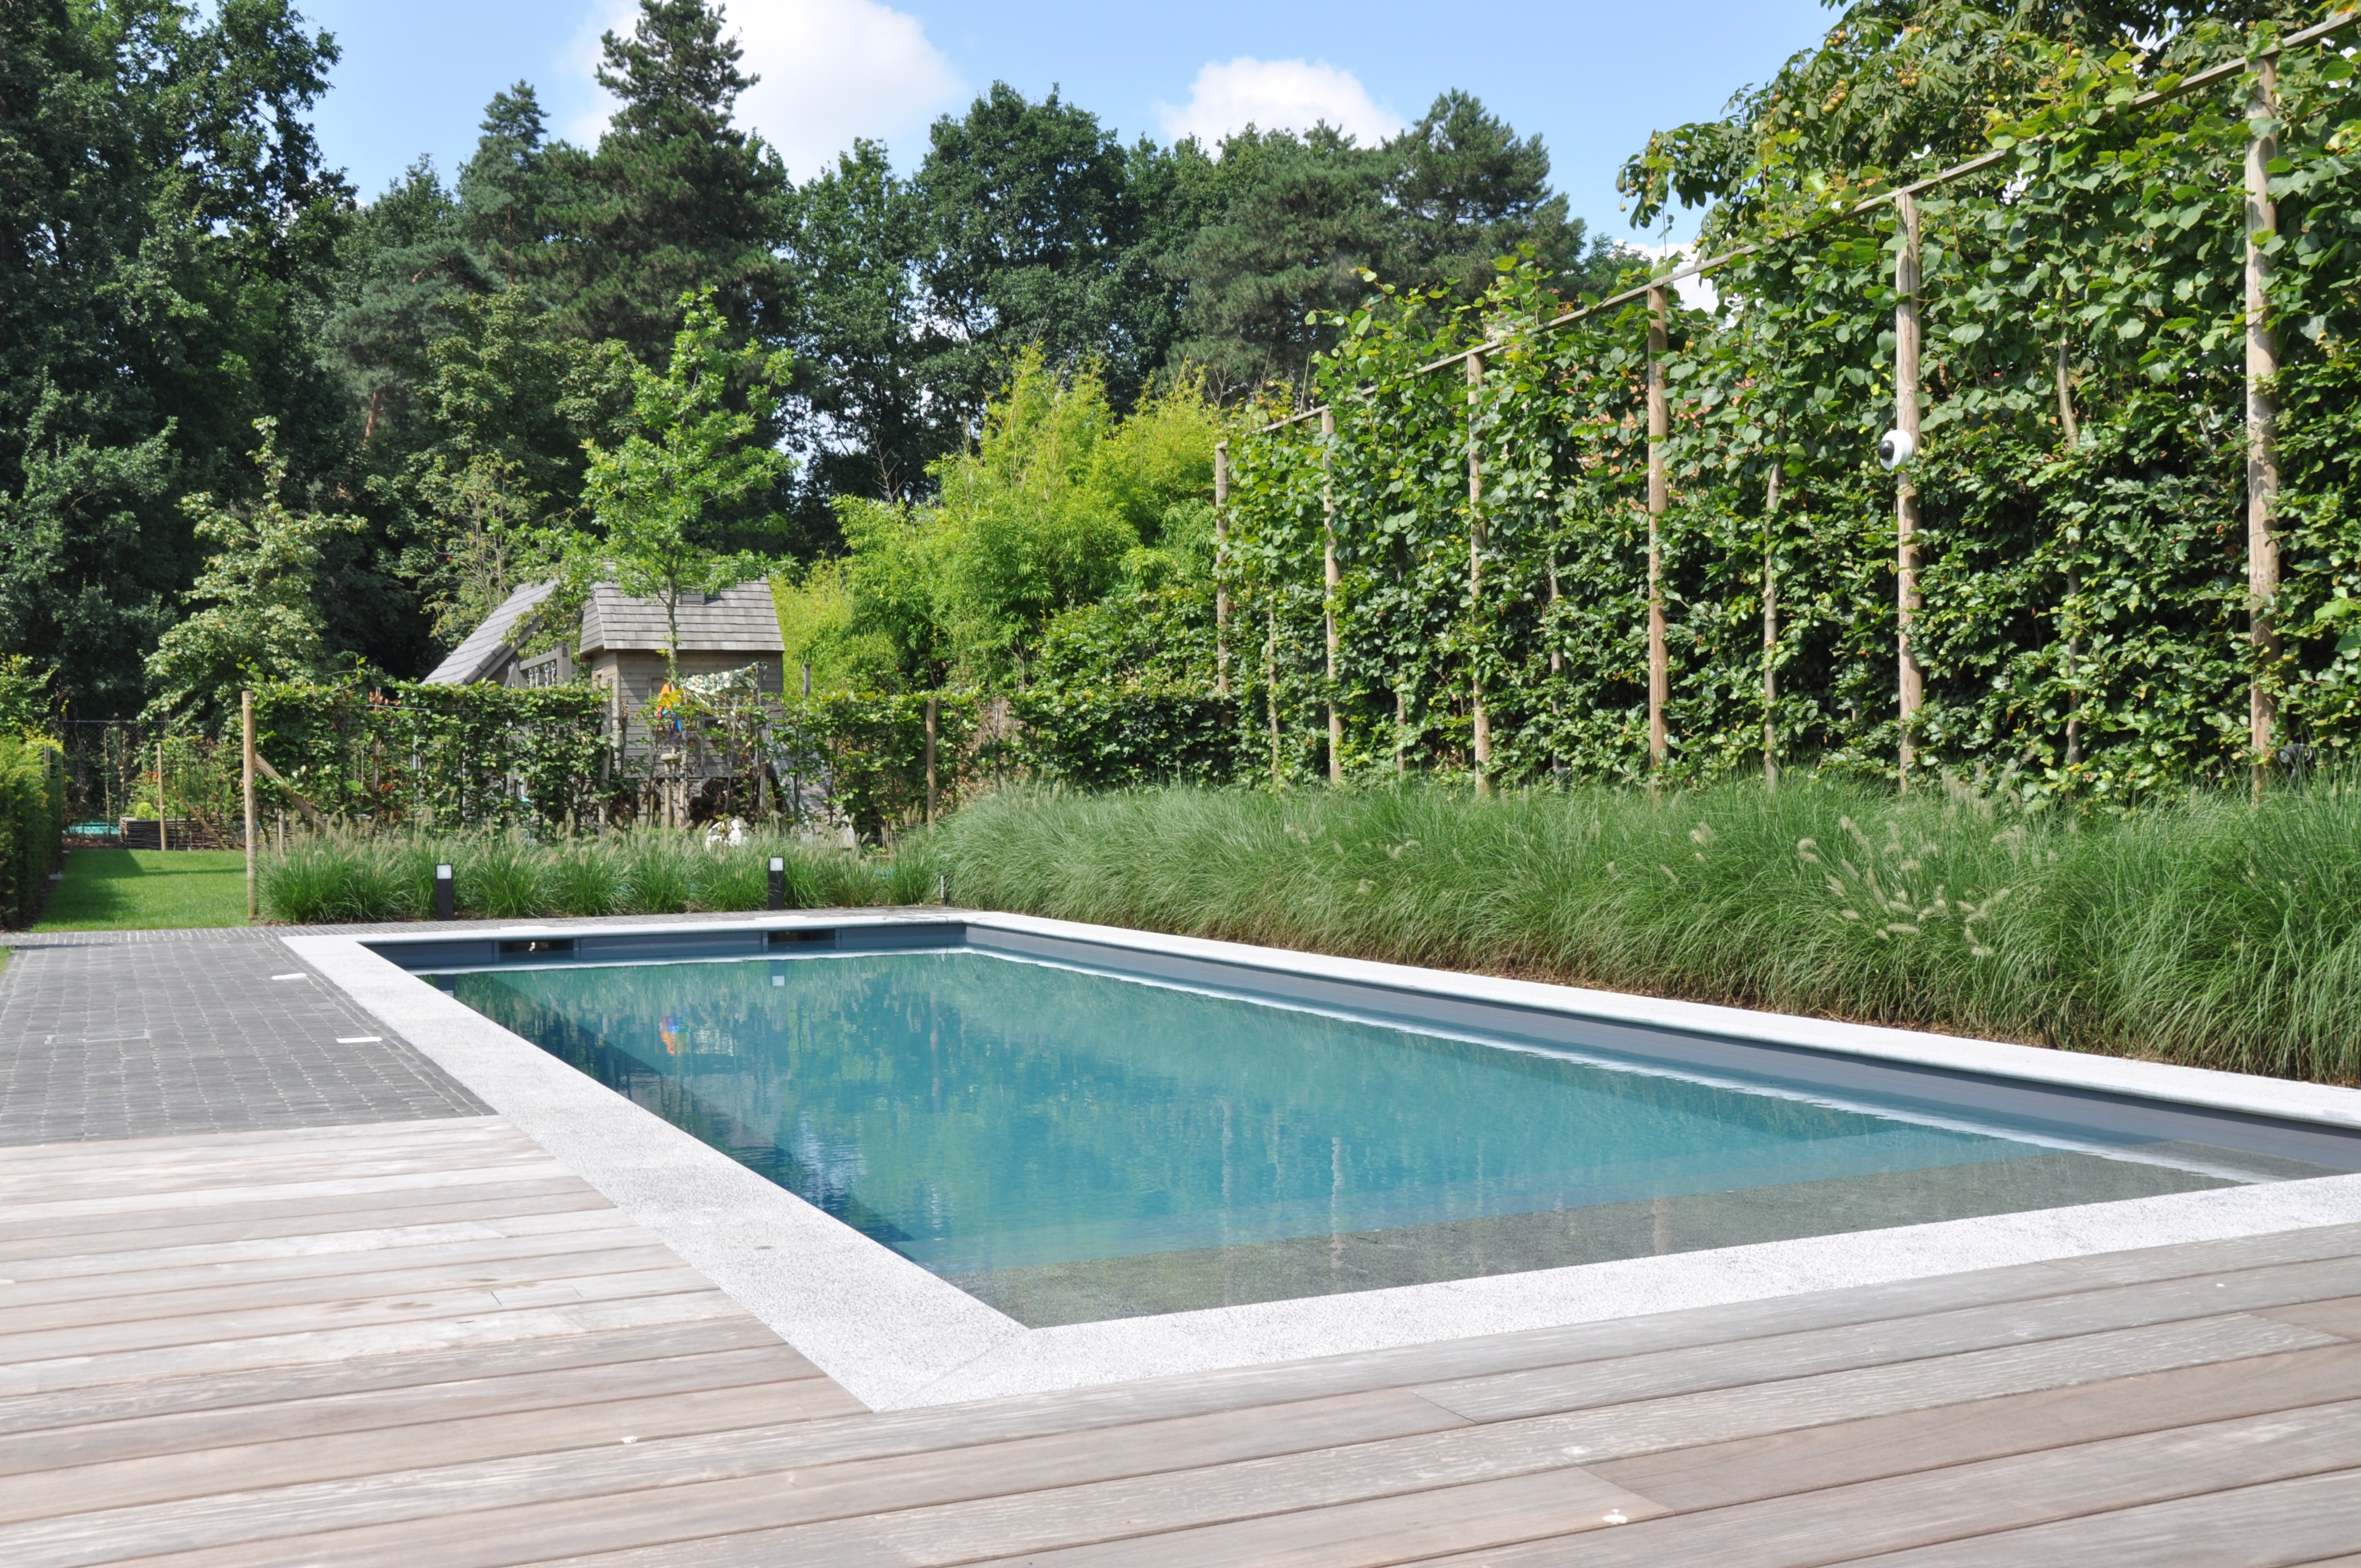 Azuralux zwembad bouwers - Liner para piscinas precio ...